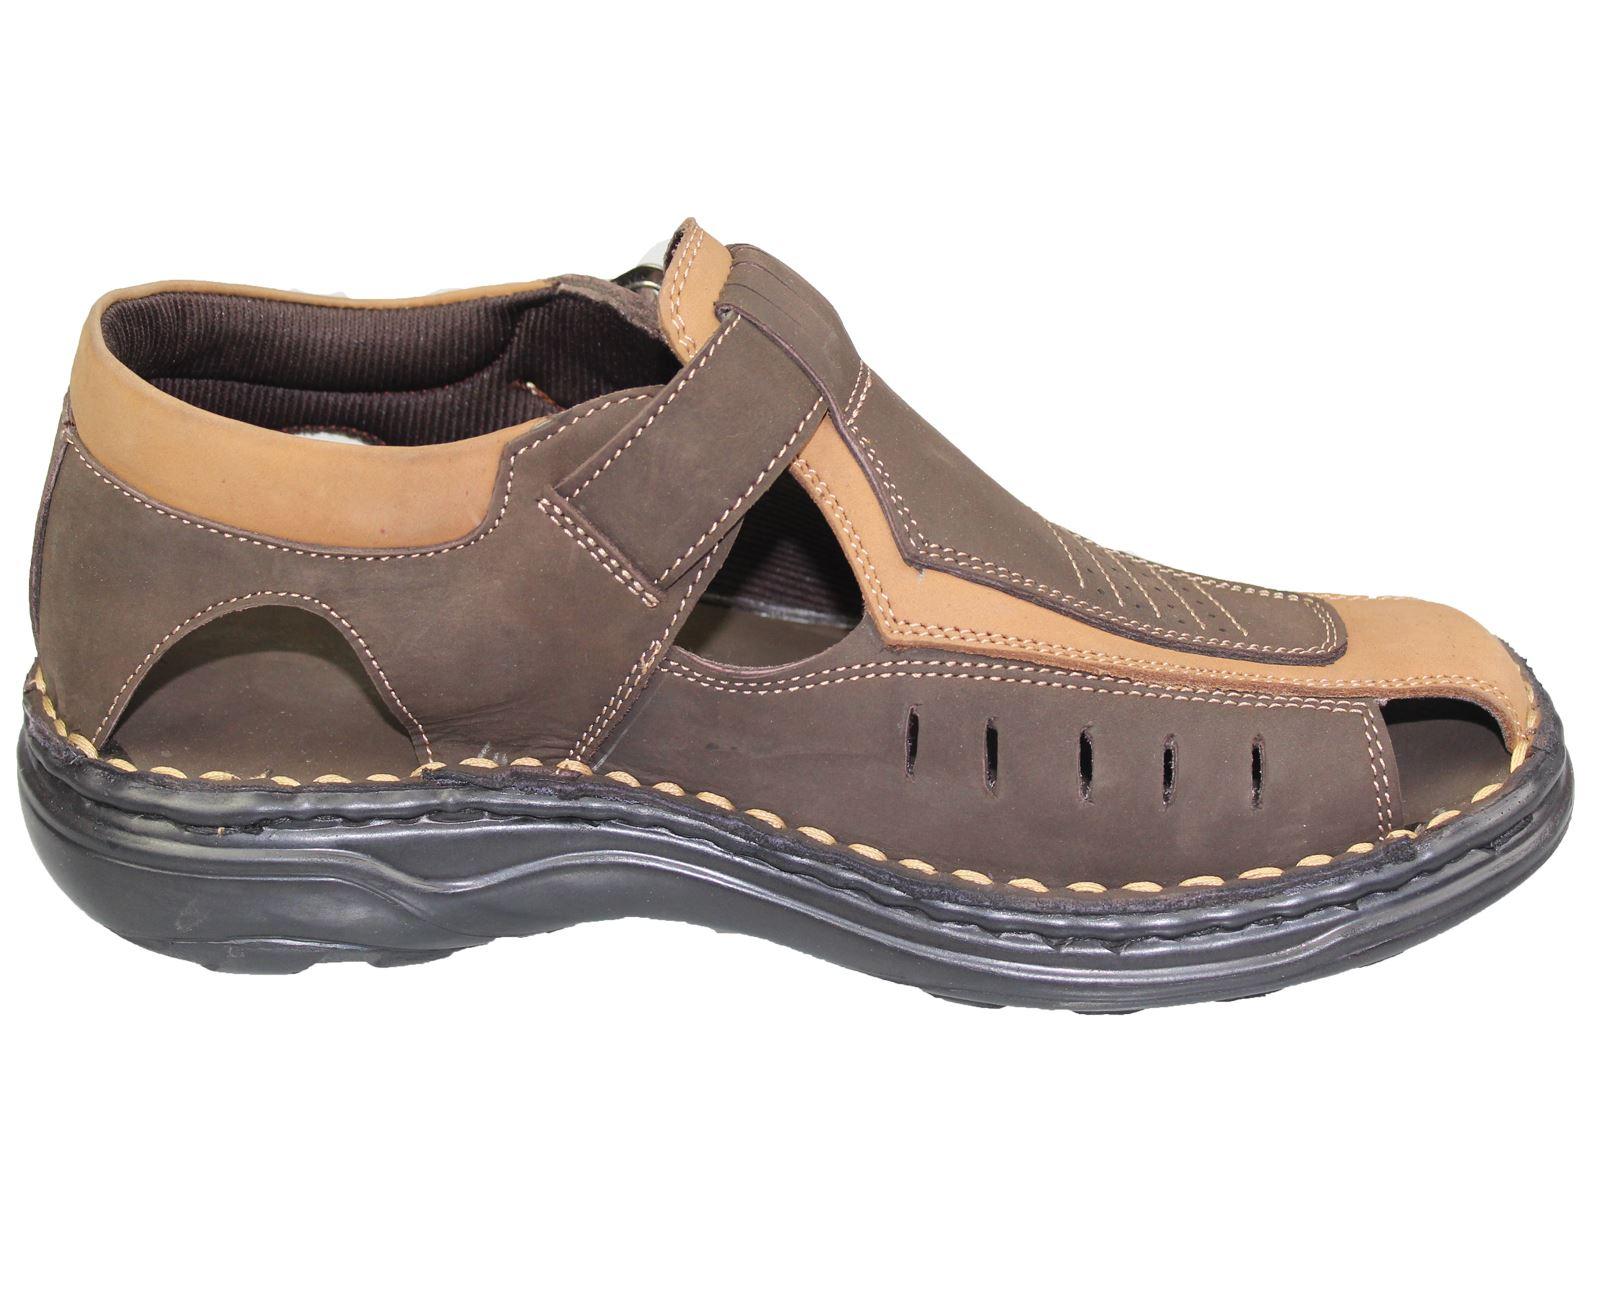 Mens-Buckle-Fastening-Sandals-Flat-Beach-Walking-Fashion-Casual-Summer-Slipper miniatura 10